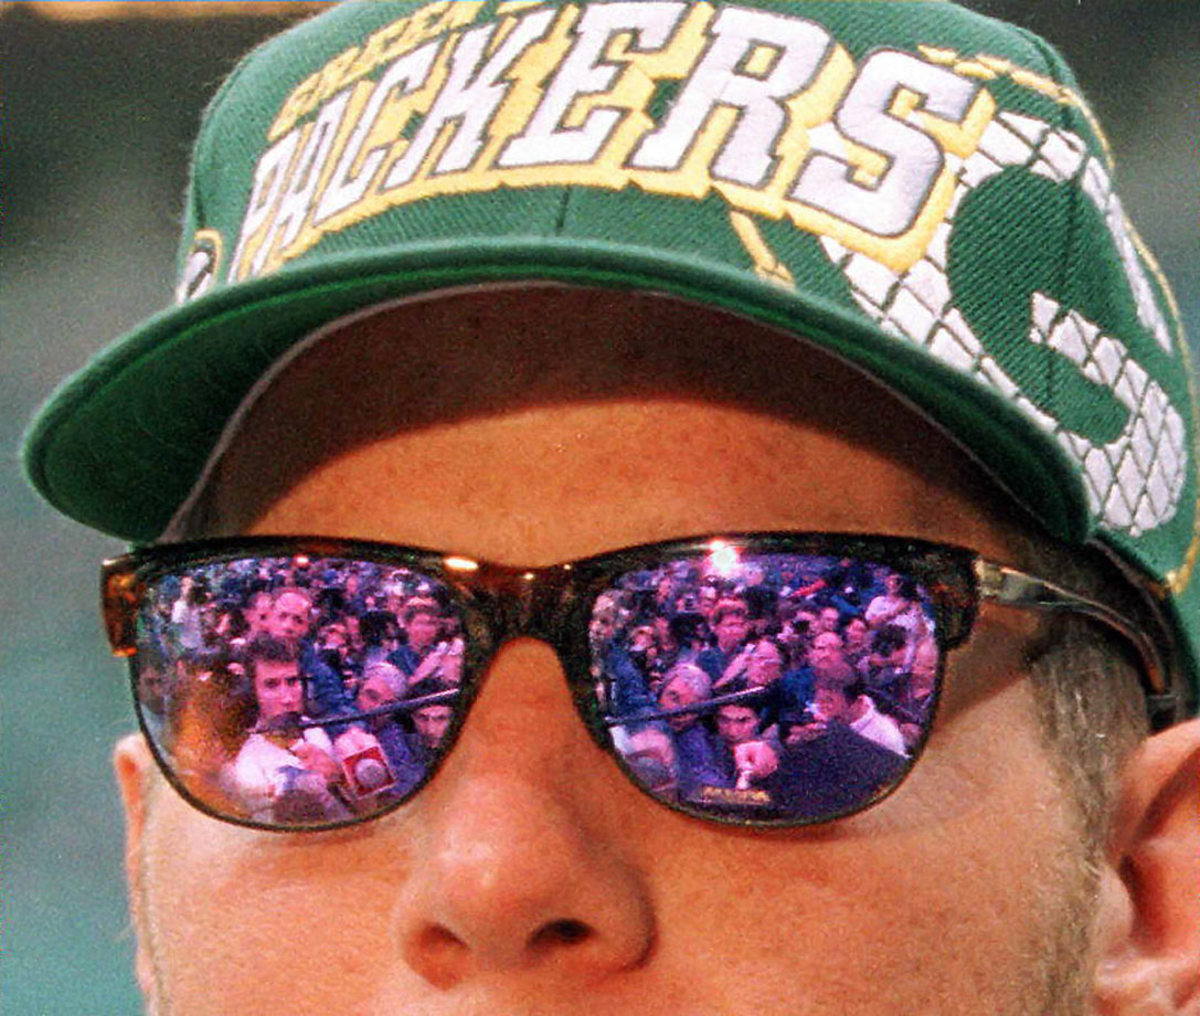 1997-Super-Bowl-XXXI-Media-Day-Brett-Favre.jpg